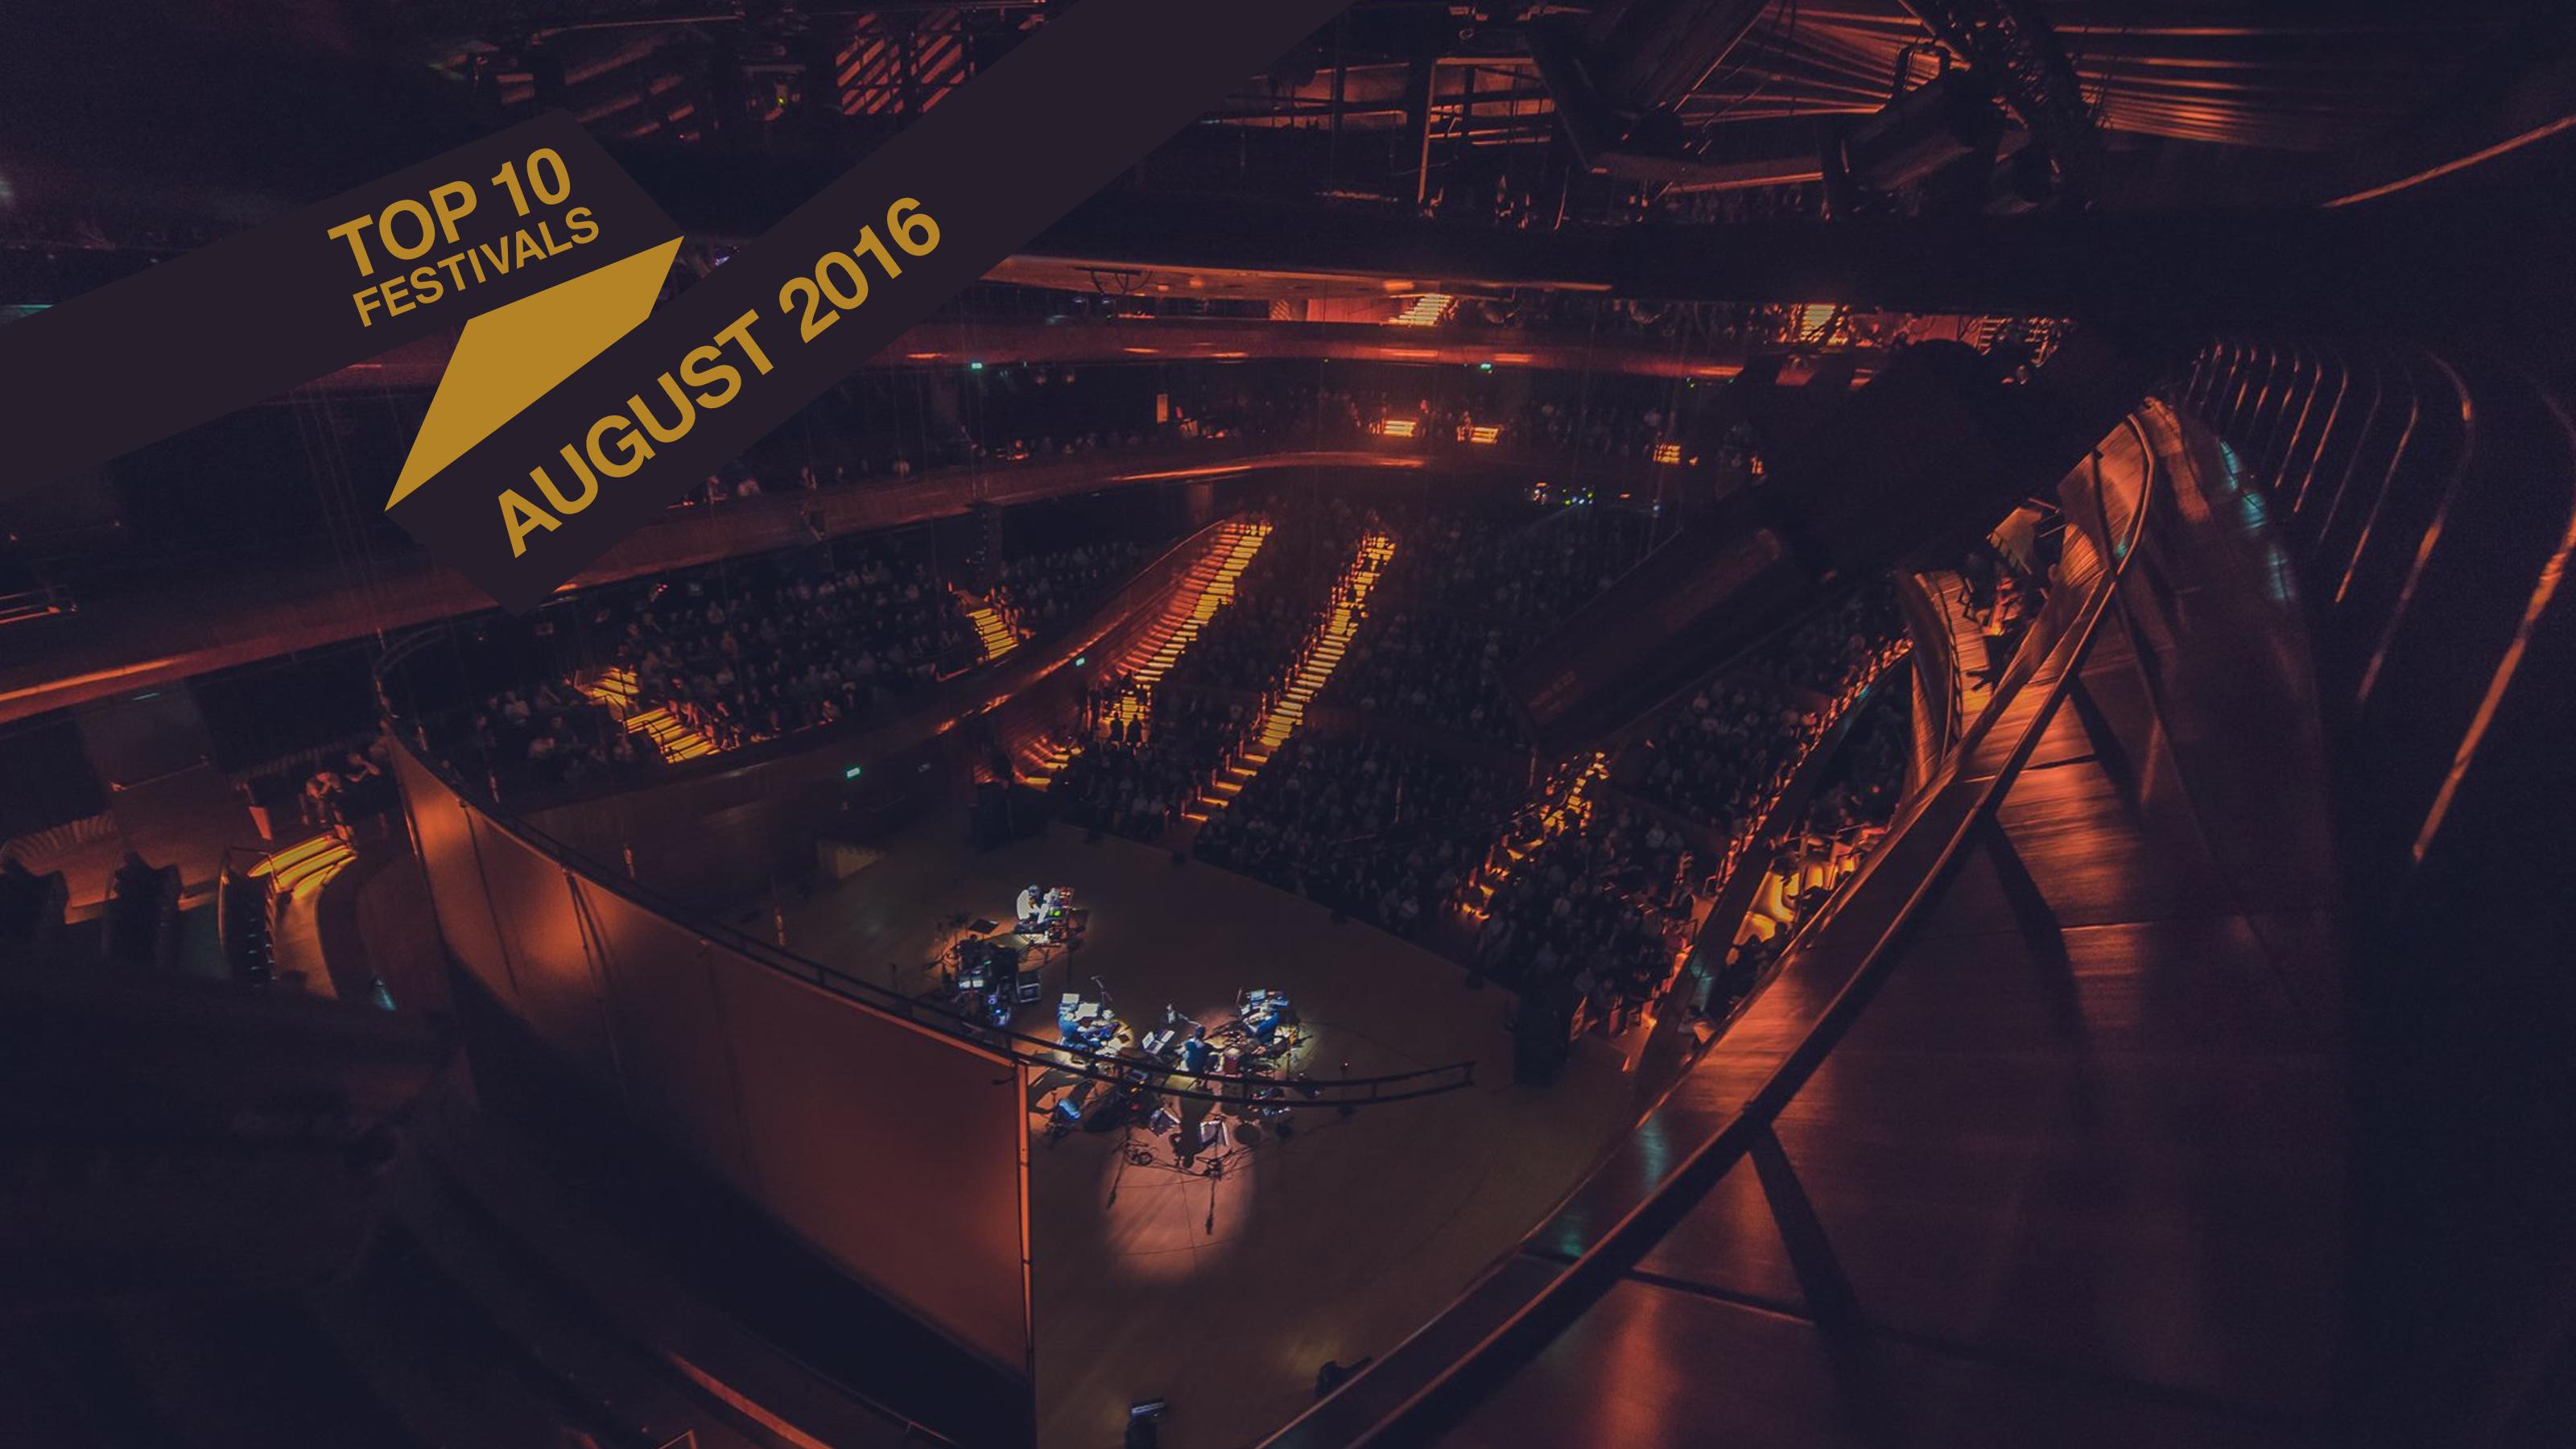 Top 10 August 2016 Festivals